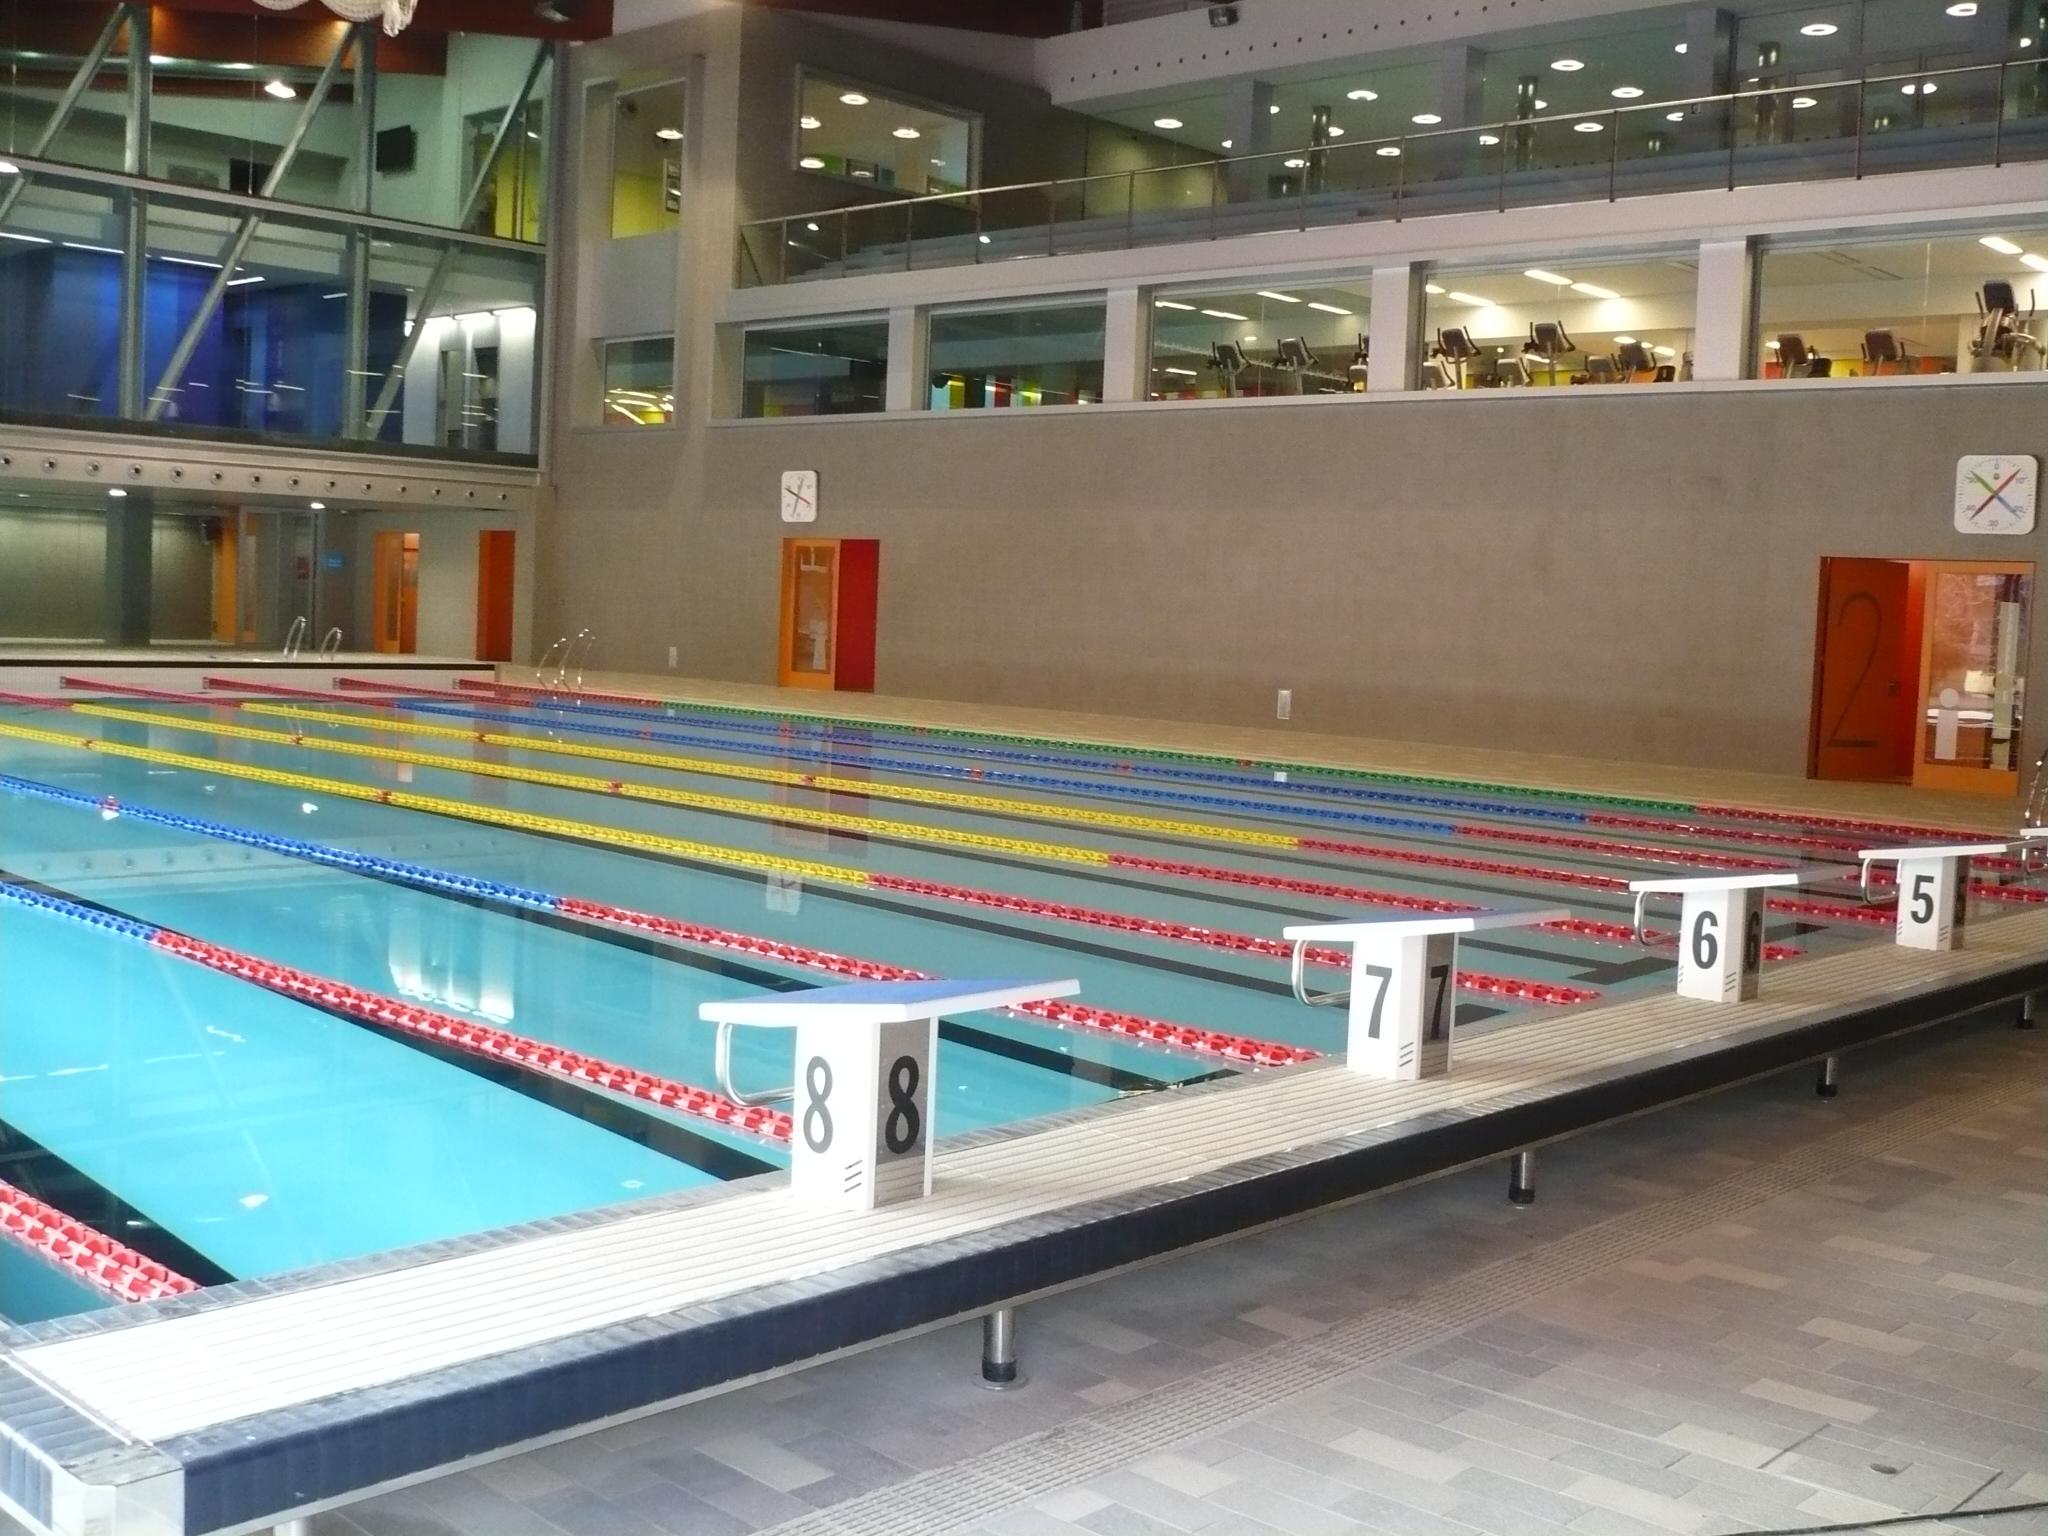 Piscinas interiores piscinas interiores piscina for Piscina interior